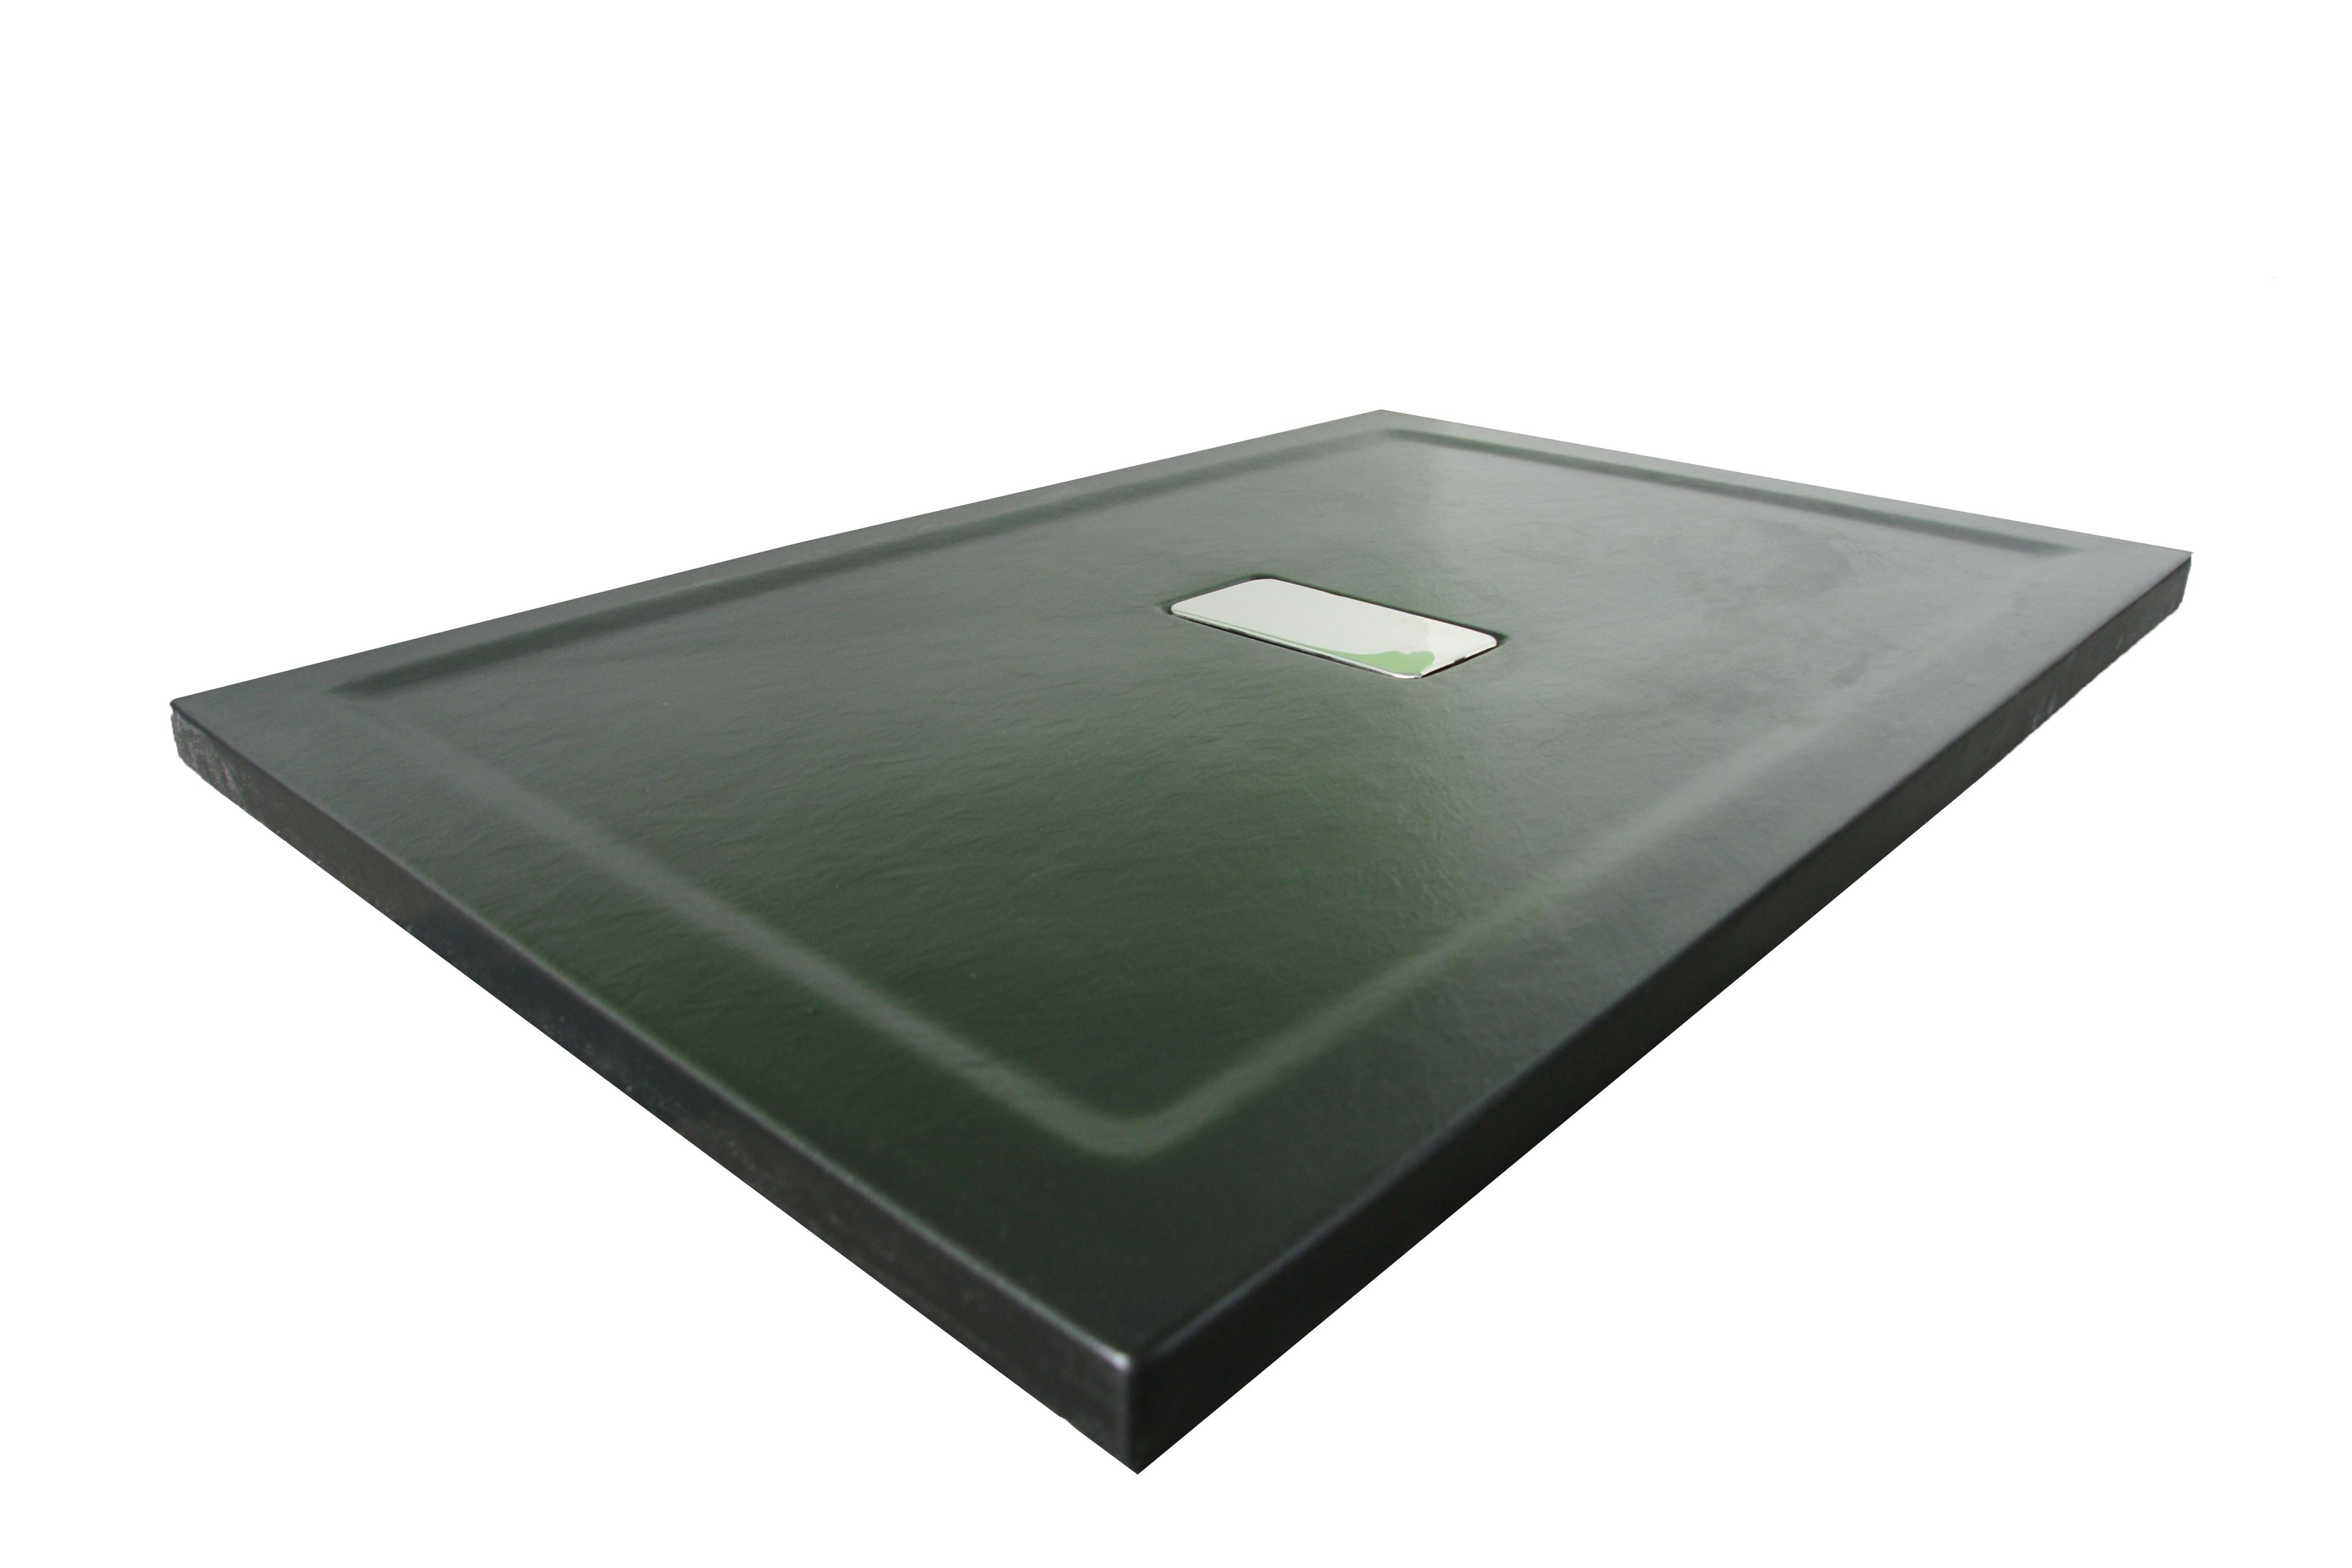 Cadita de dus Relax 160x80 - finisaj texturat negru mat1